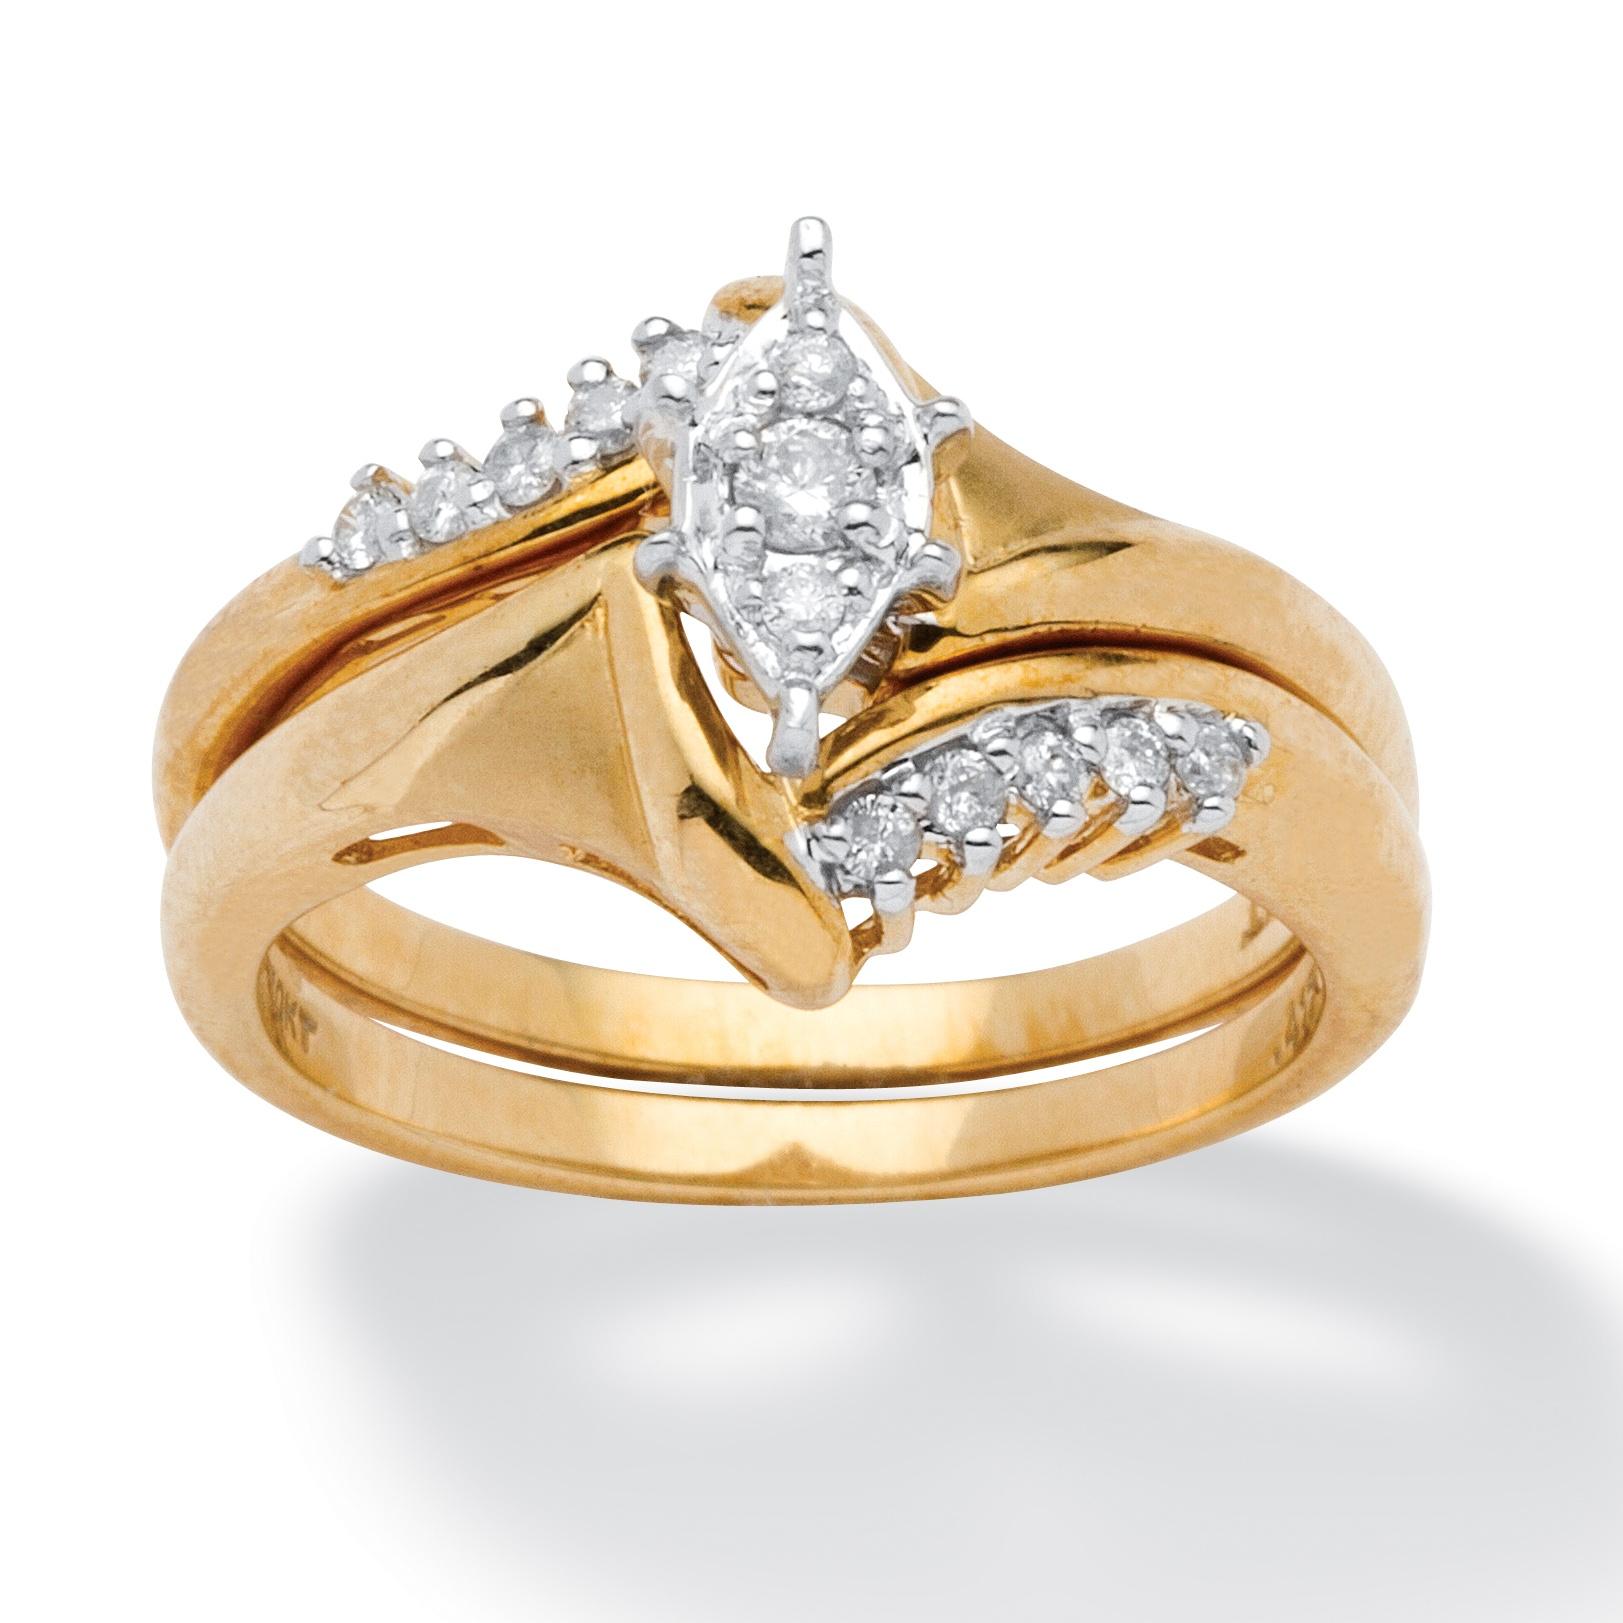 15 TCW Round Diamond 10k Yellow Gold 2 Piece Bridal